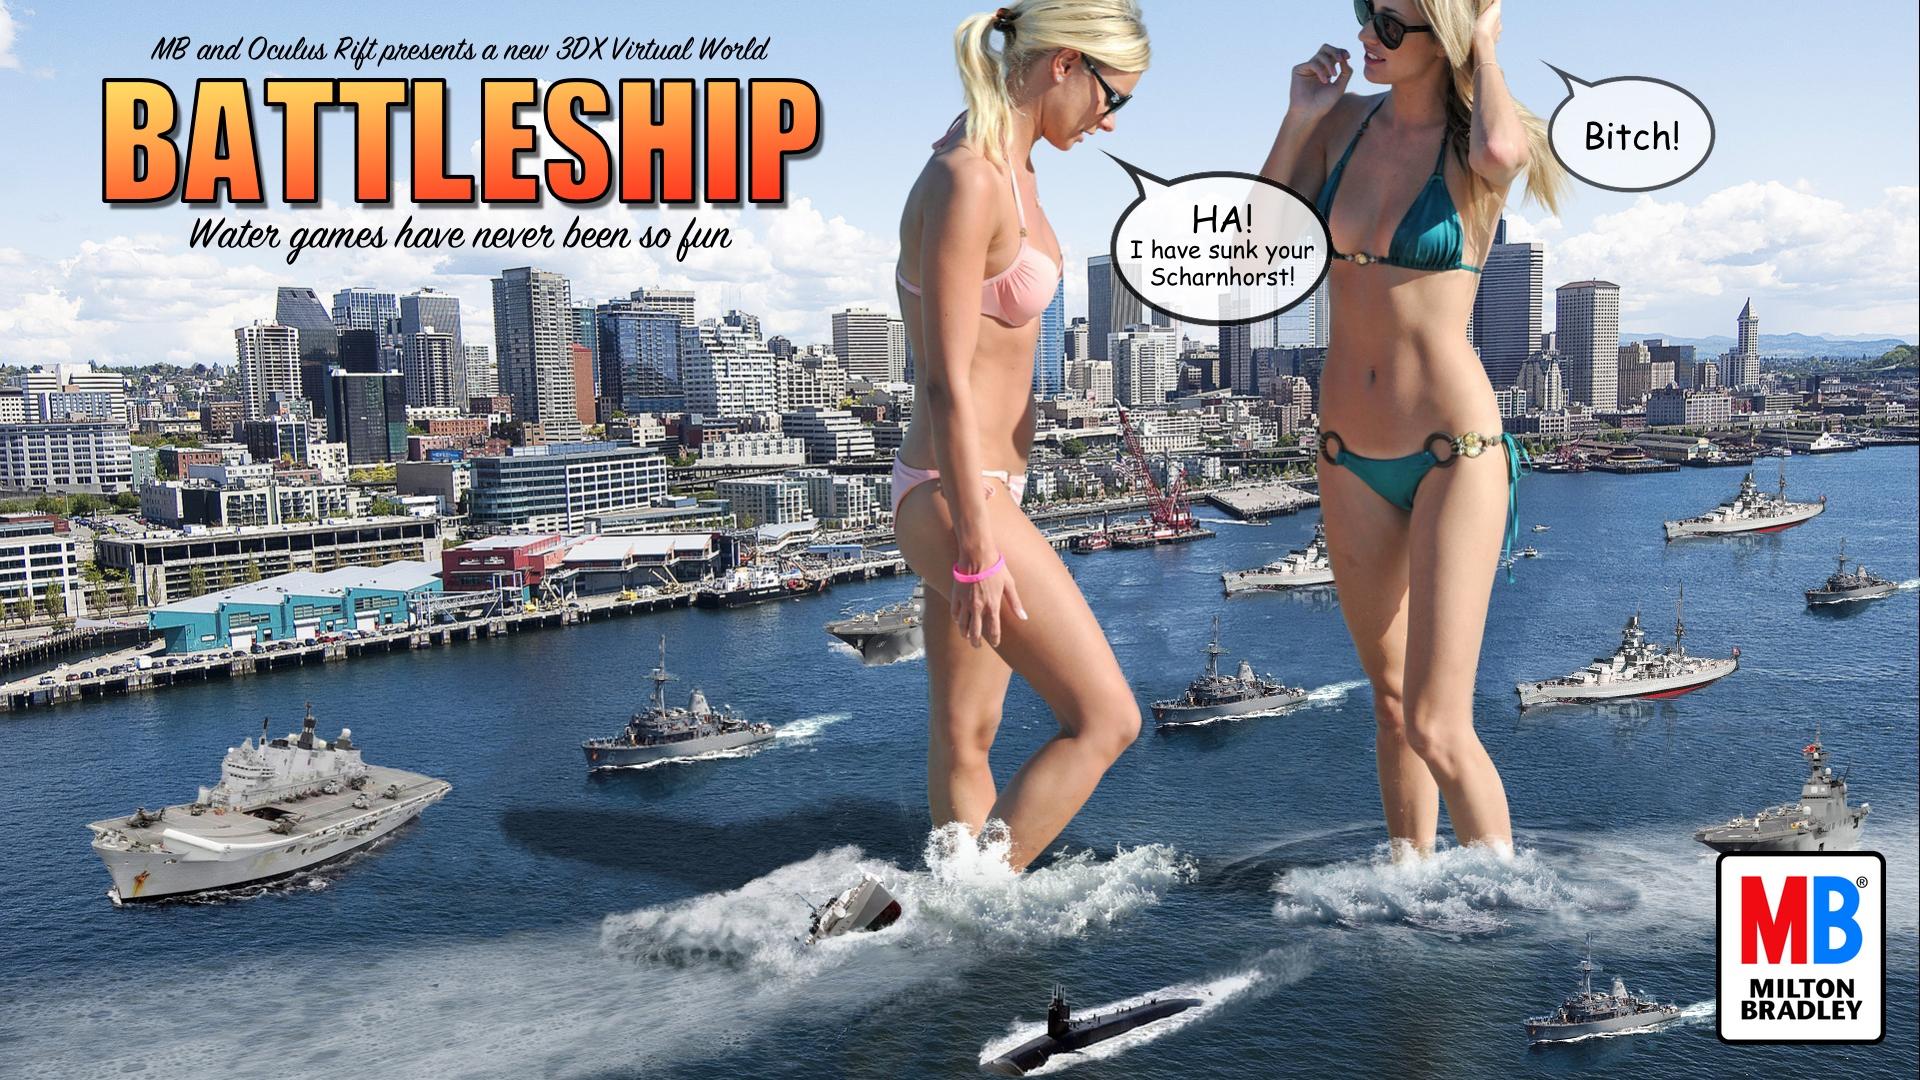 battleshipq0sxq.jpg